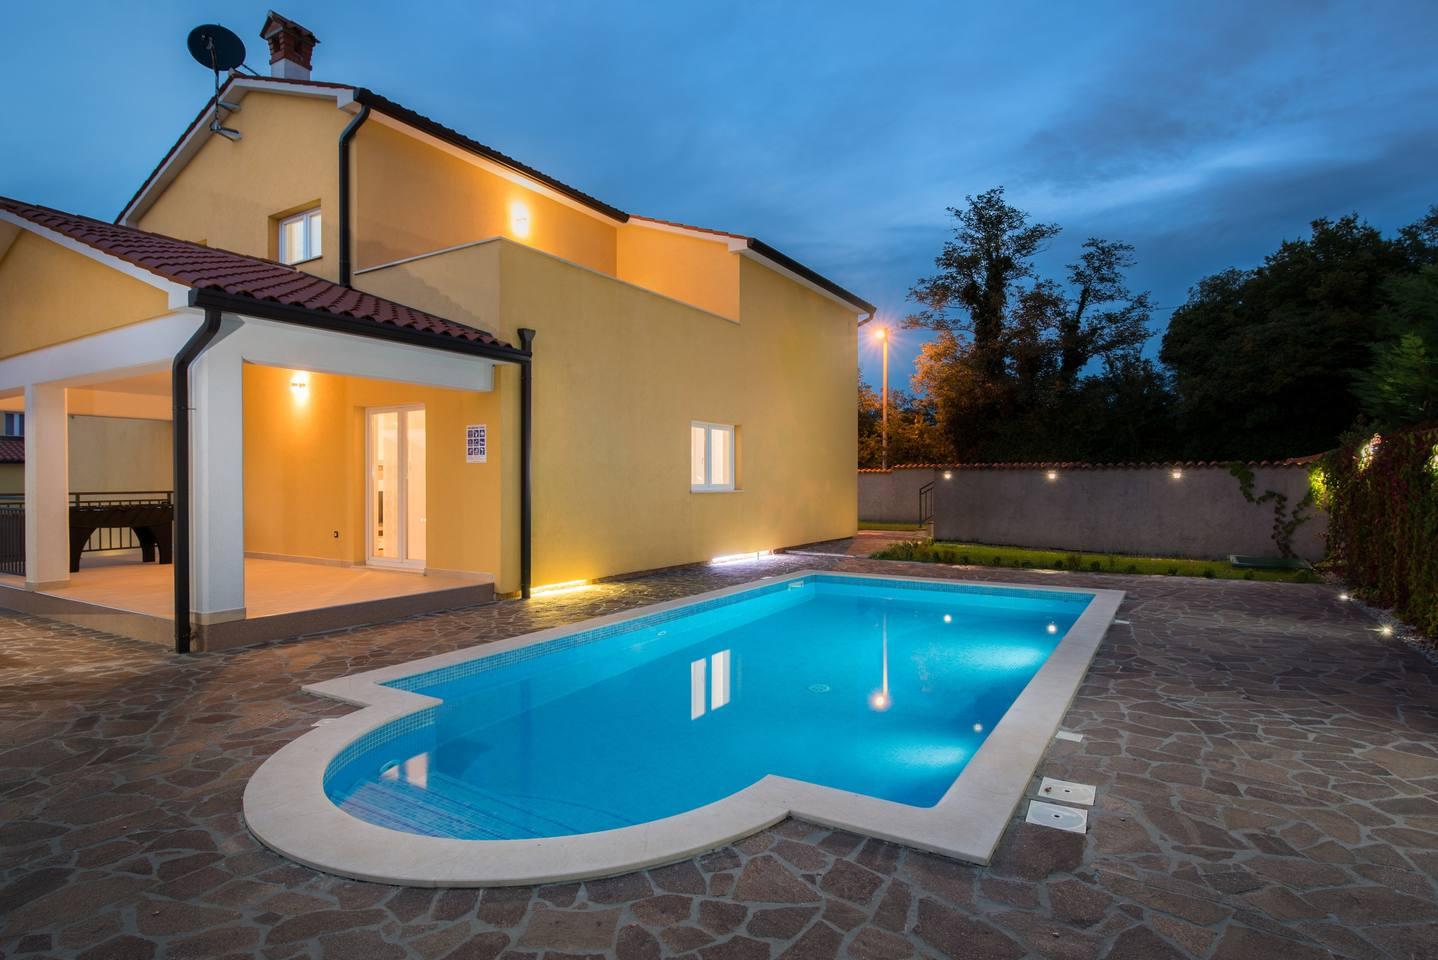 Villa in Zartinj photo 16921183